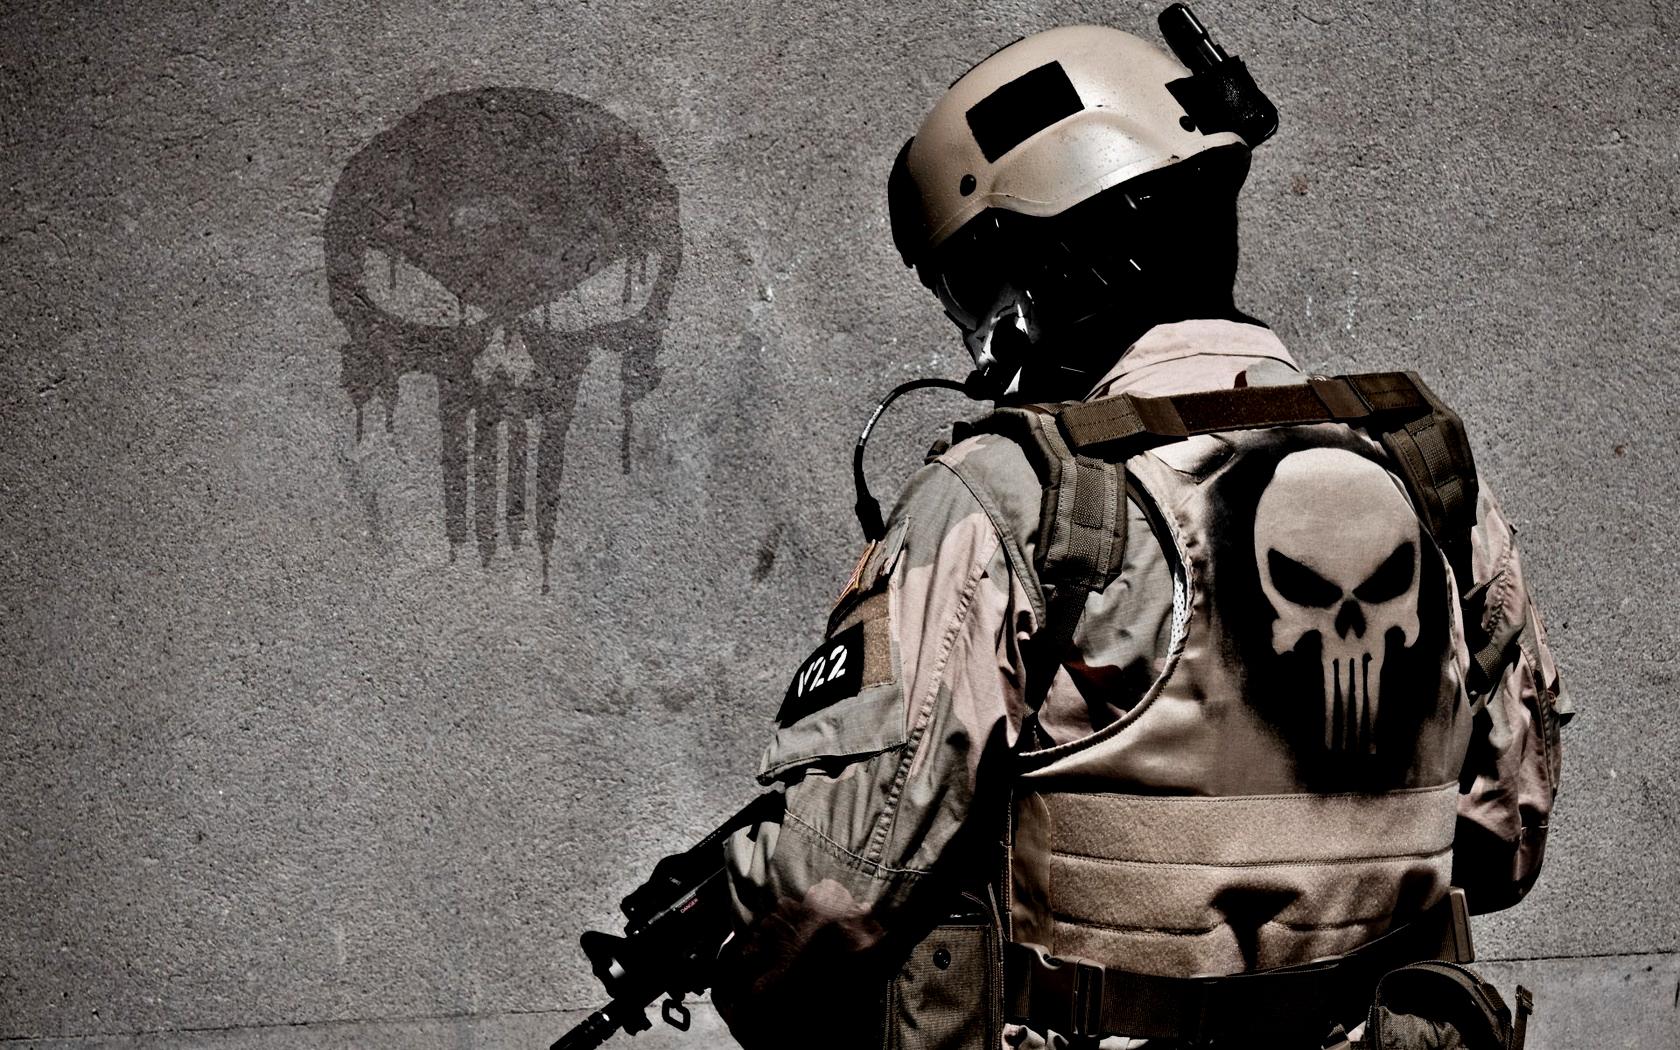 Wallpaper The Punisher Soldier 1680x1050 Macmln